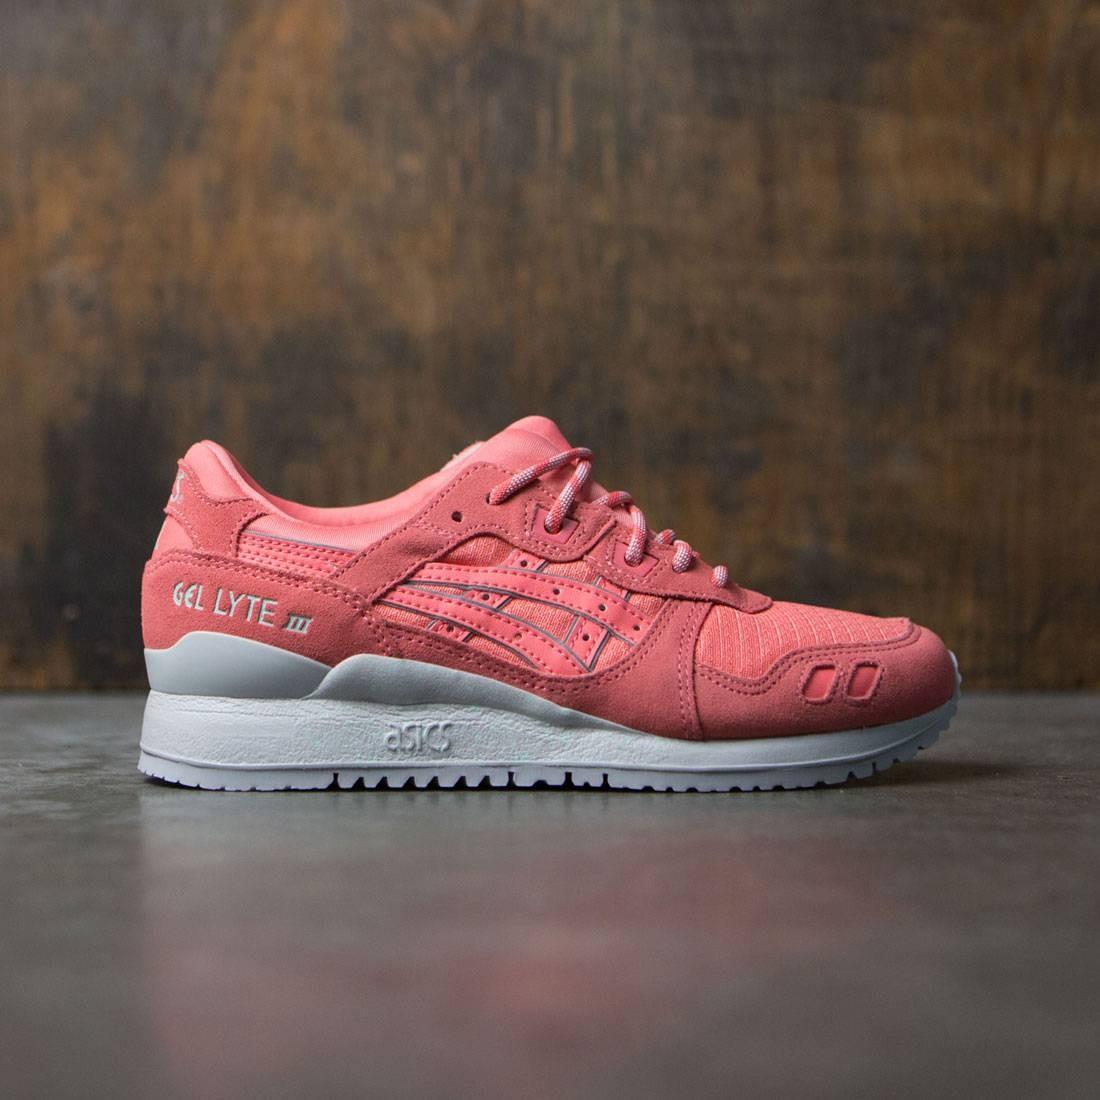 Asics Tiger Women Gel Lyte III pink peach H7M5L 7676 | eBay